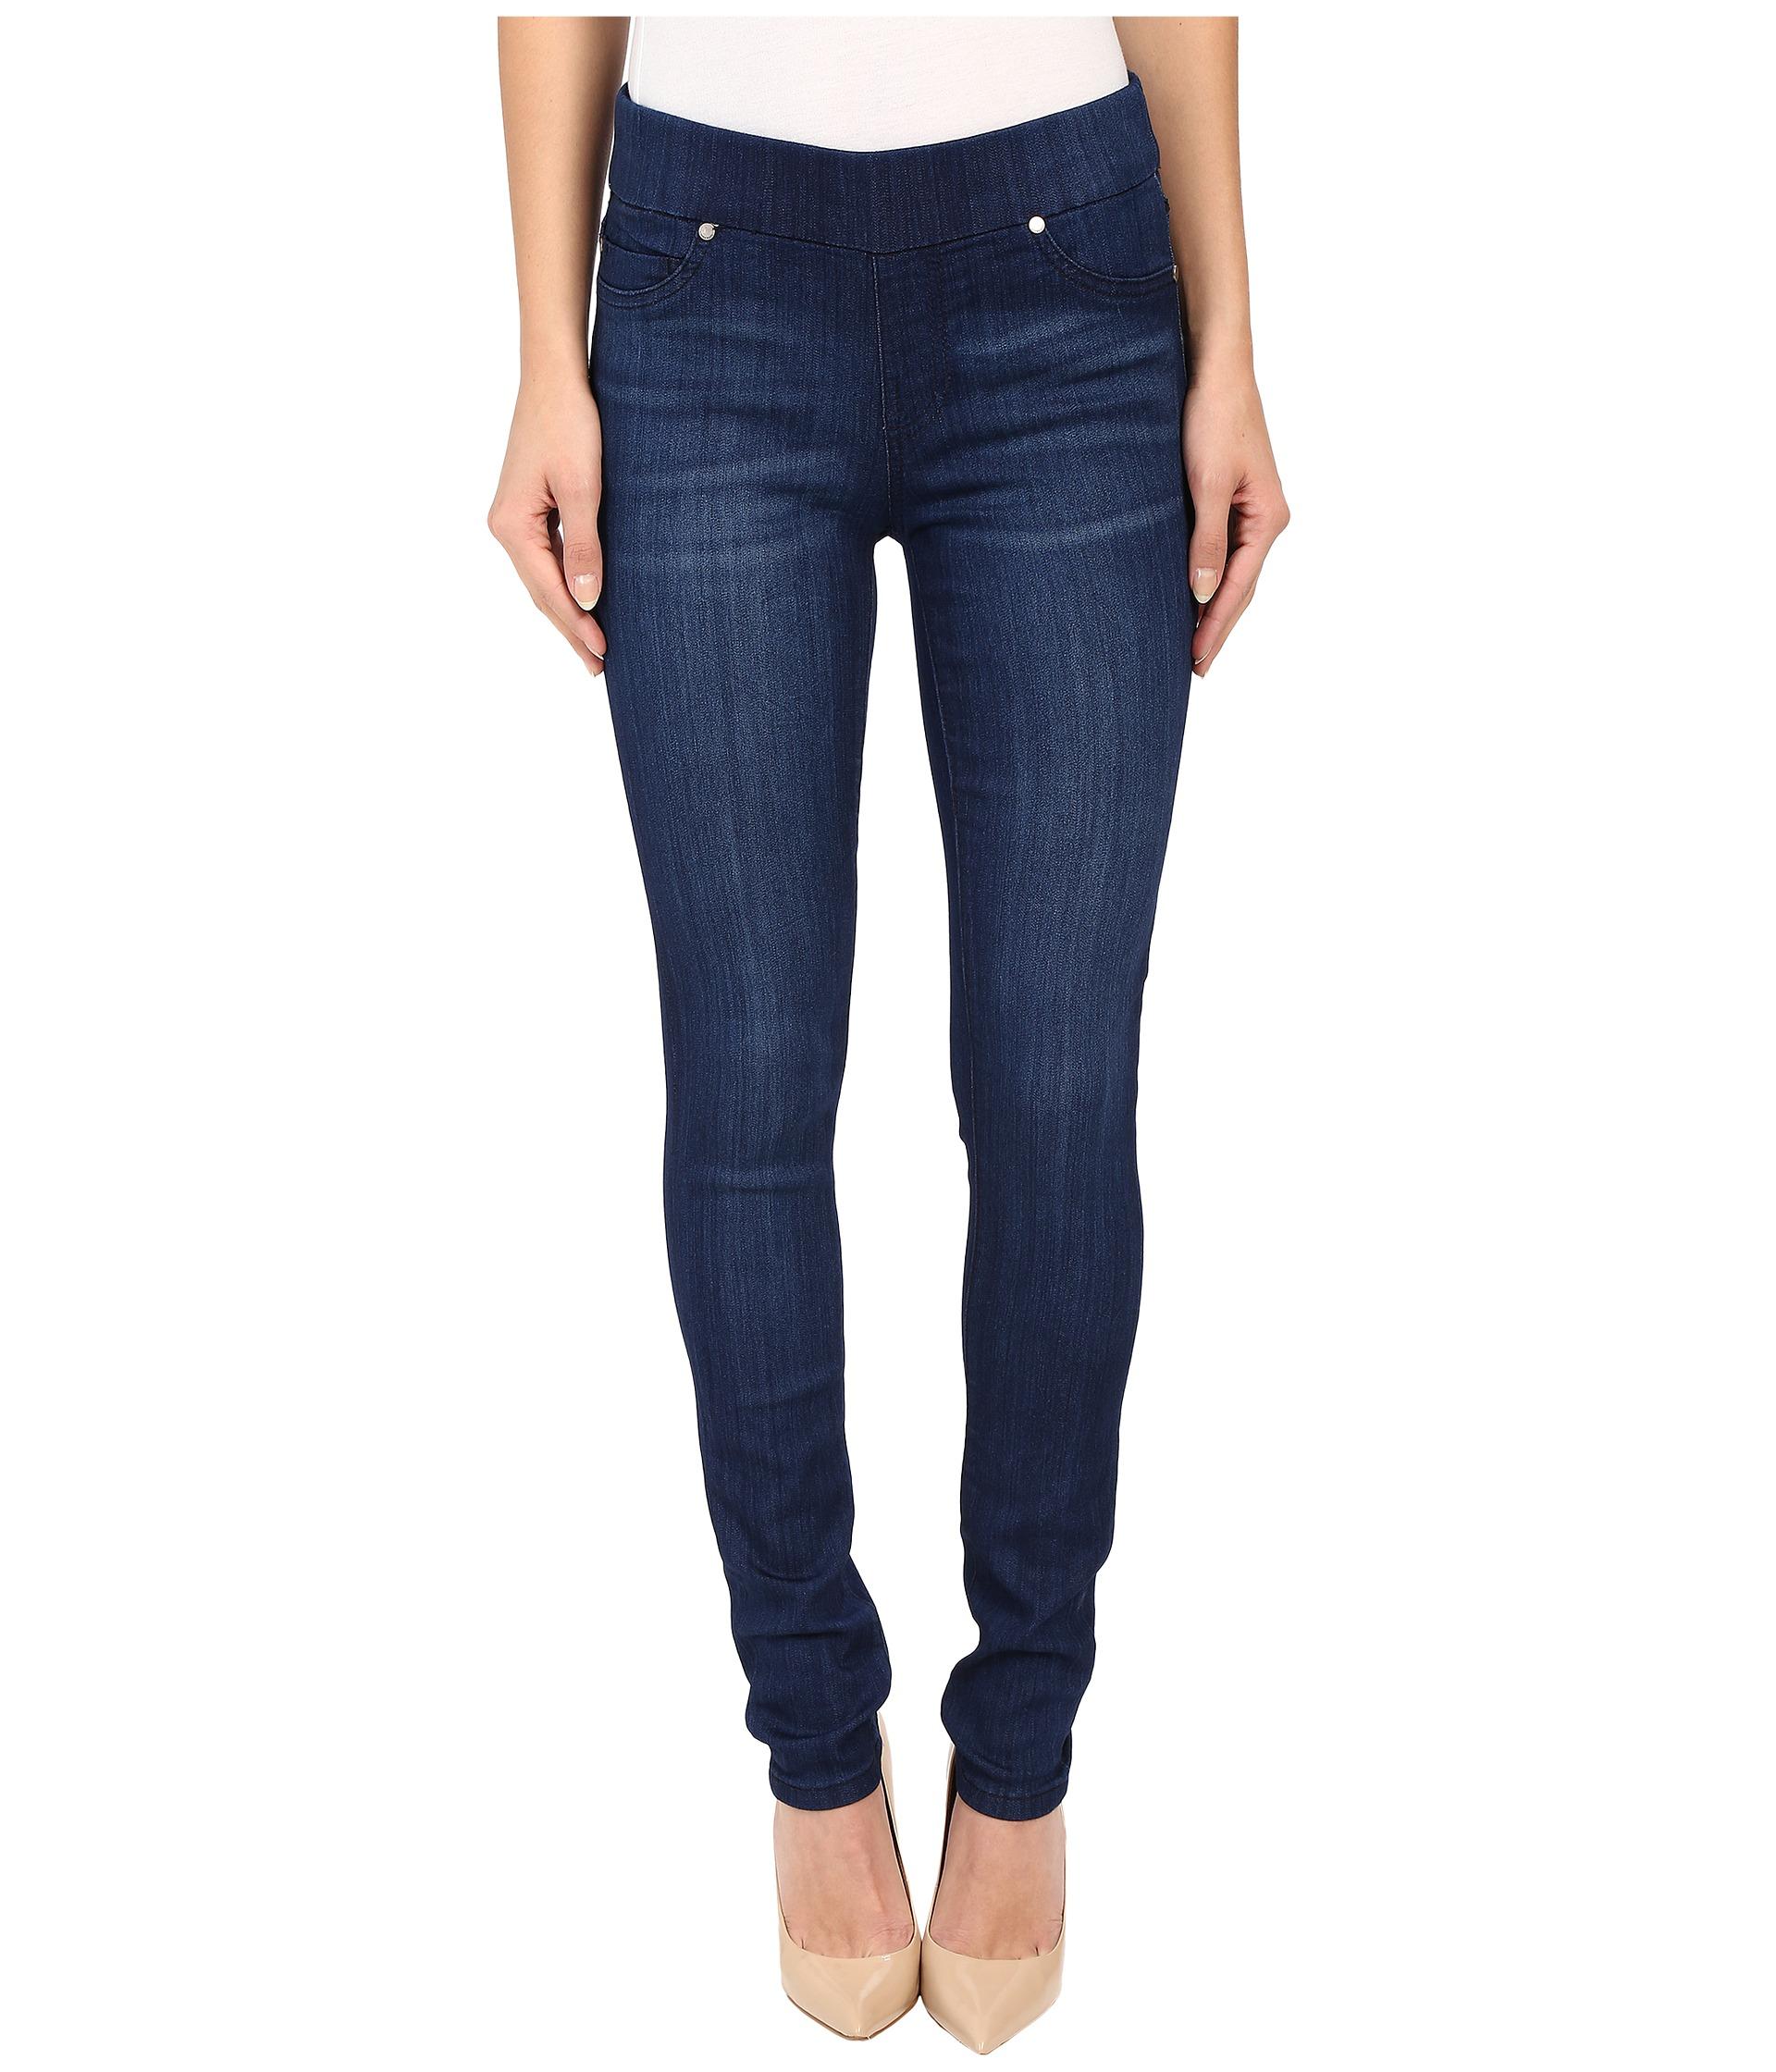 Liverpool Sienna Pull On Silky Soft Denim Skinny Jean